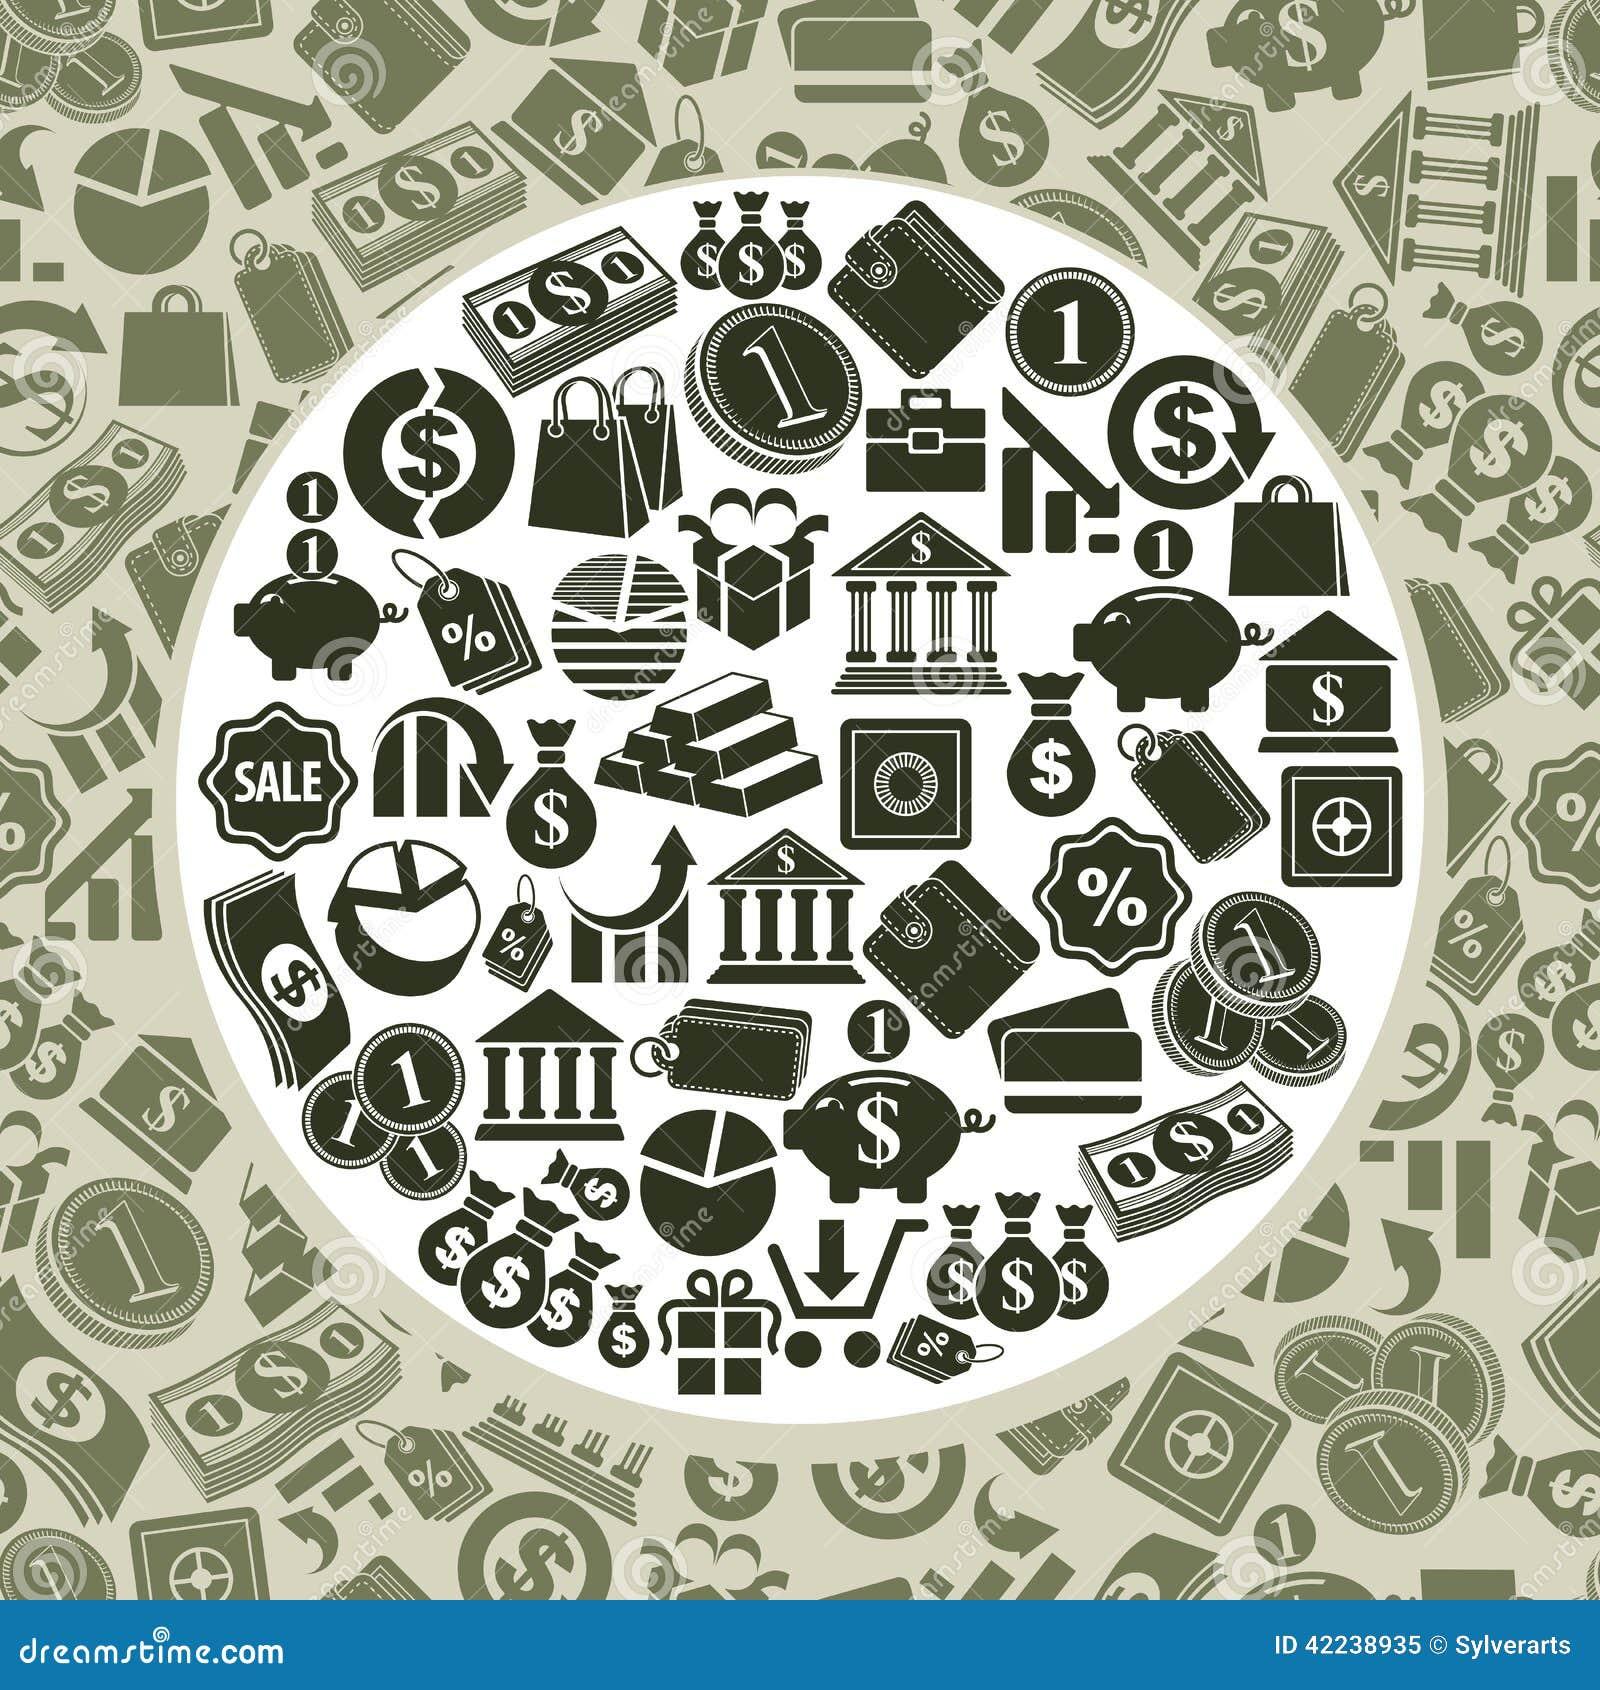 Finance Background: Money Icons Vector Set, Finance Theme Simplistic Symbols